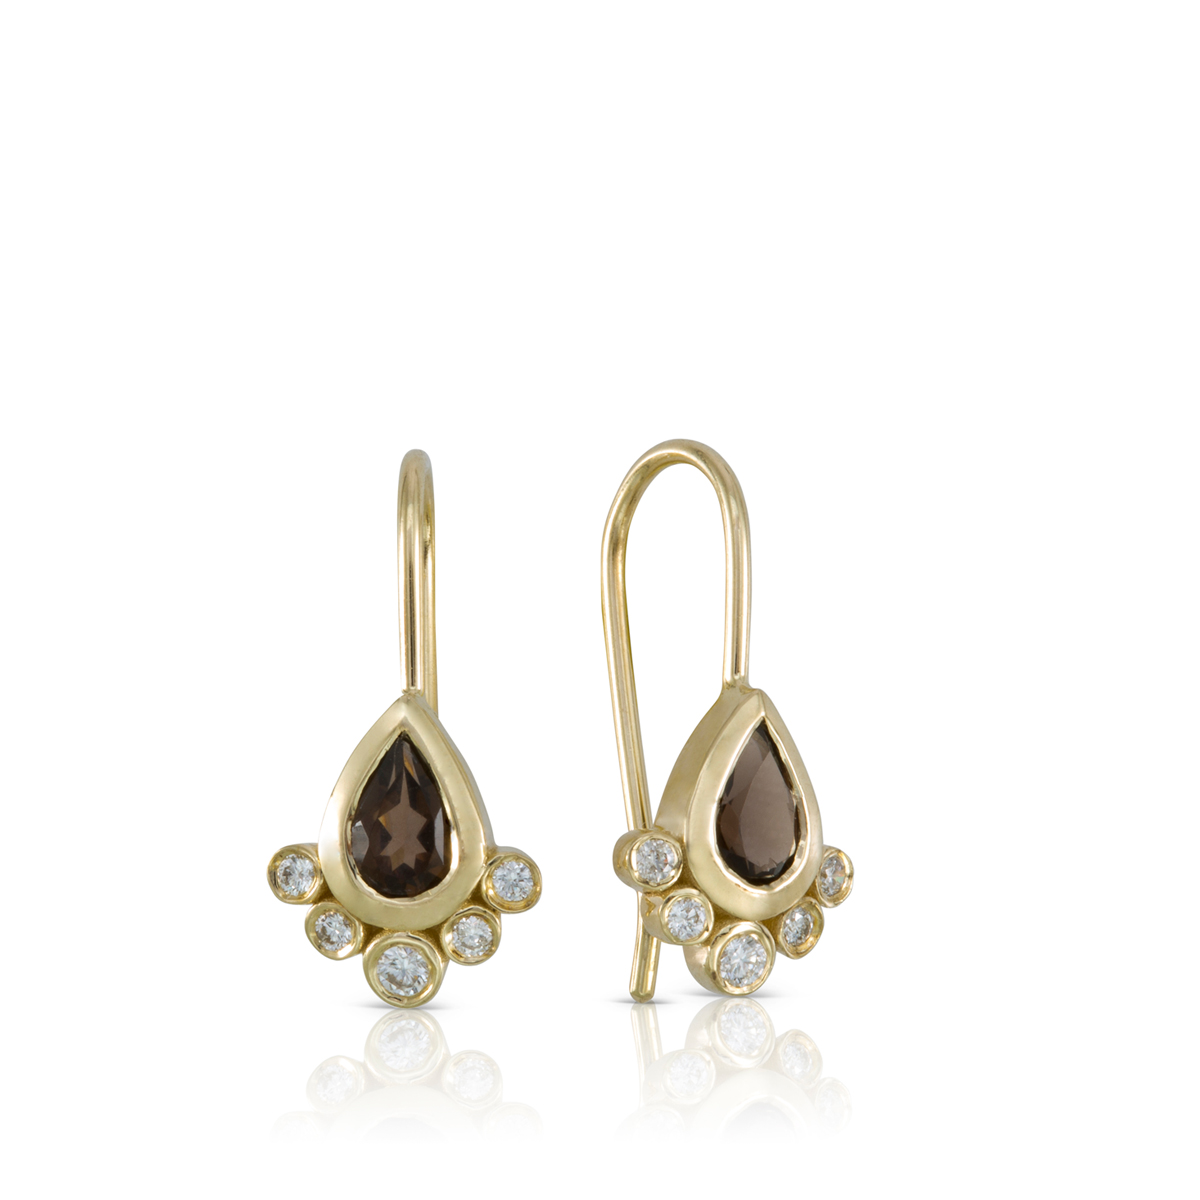 Dungle smoky quartz and diamonds earrings